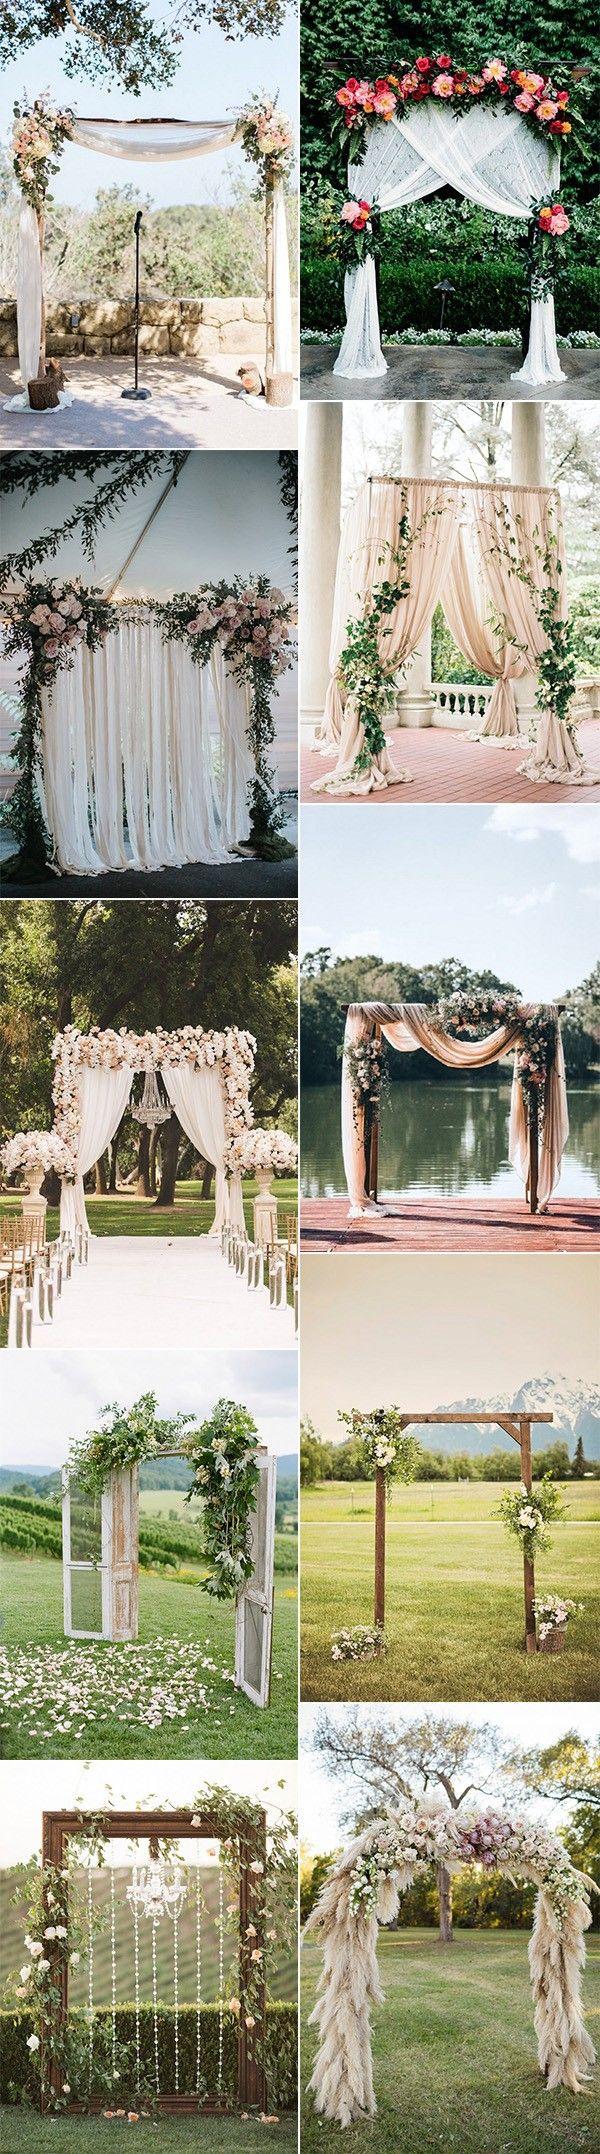 top 10 trending wedding arch decoration ideas